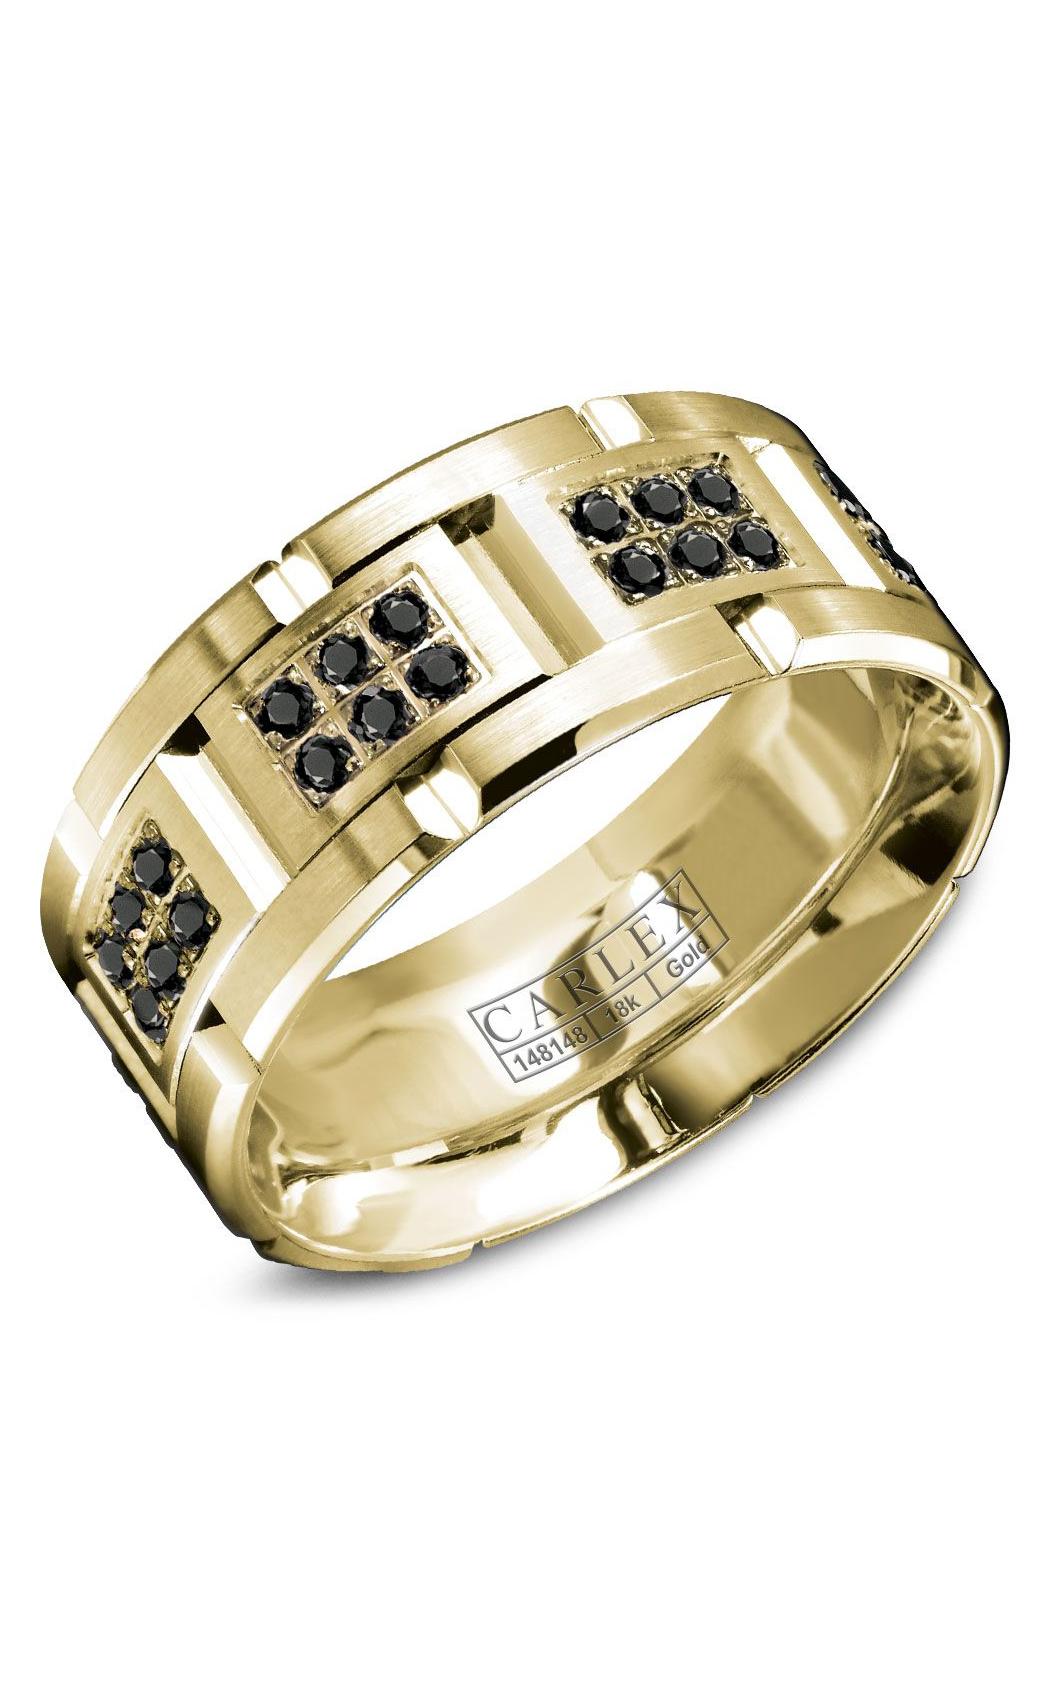 Carlex G1 WB-9461 product image